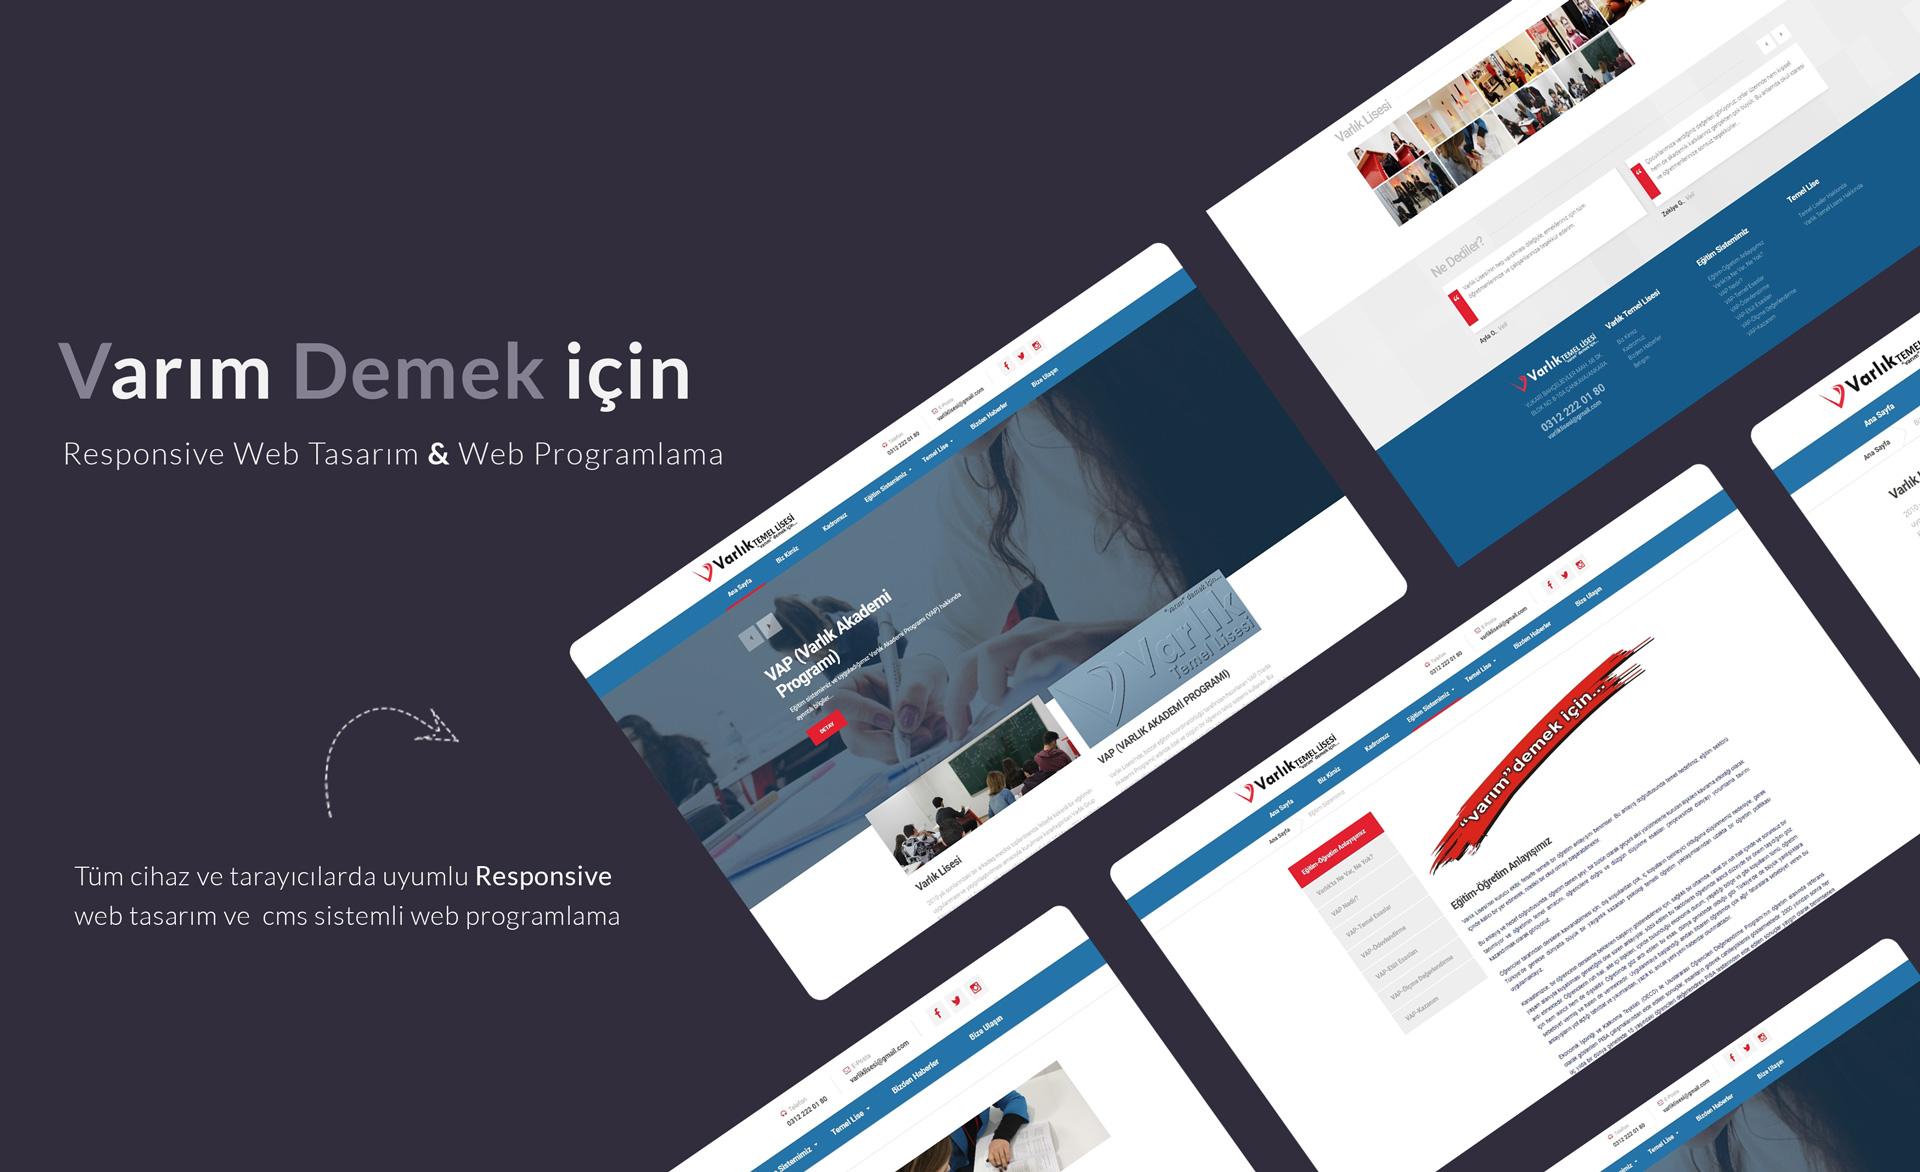 Web Tasarım, CMS, Web Programlama